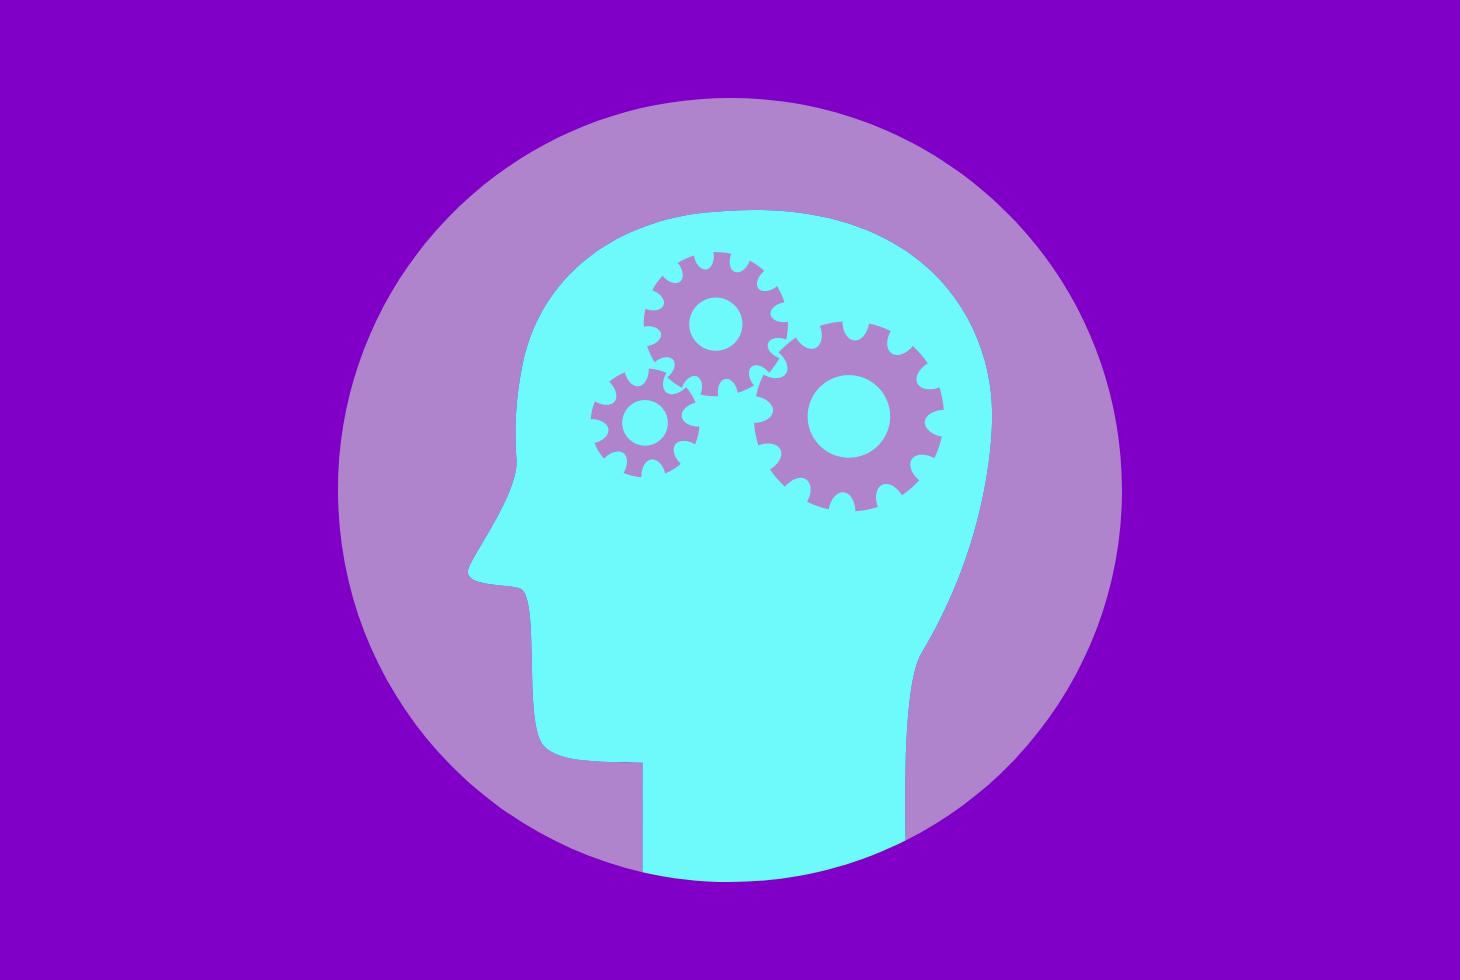 Descriptive Image - Three Gears in Head